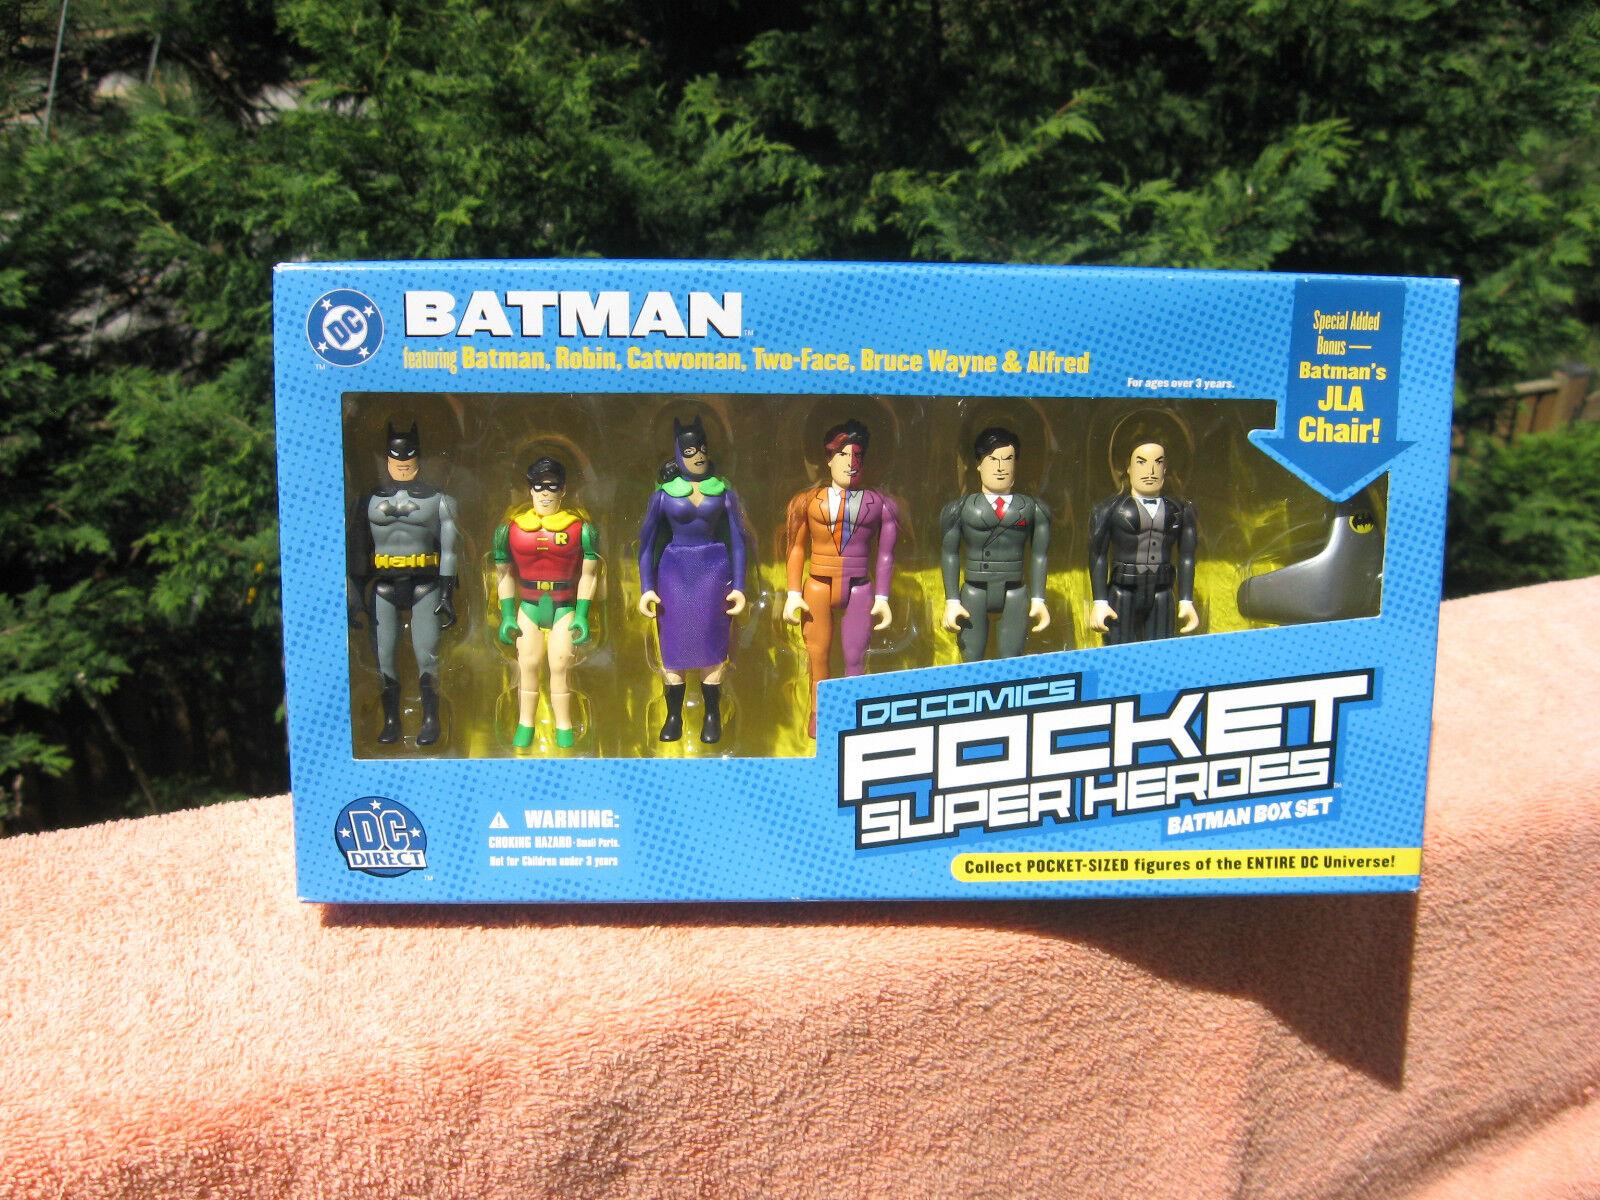 DC Direct Batuomo Pocket Super Heroes 6 cifras Set & Batuomo's JLA Chairnuovo